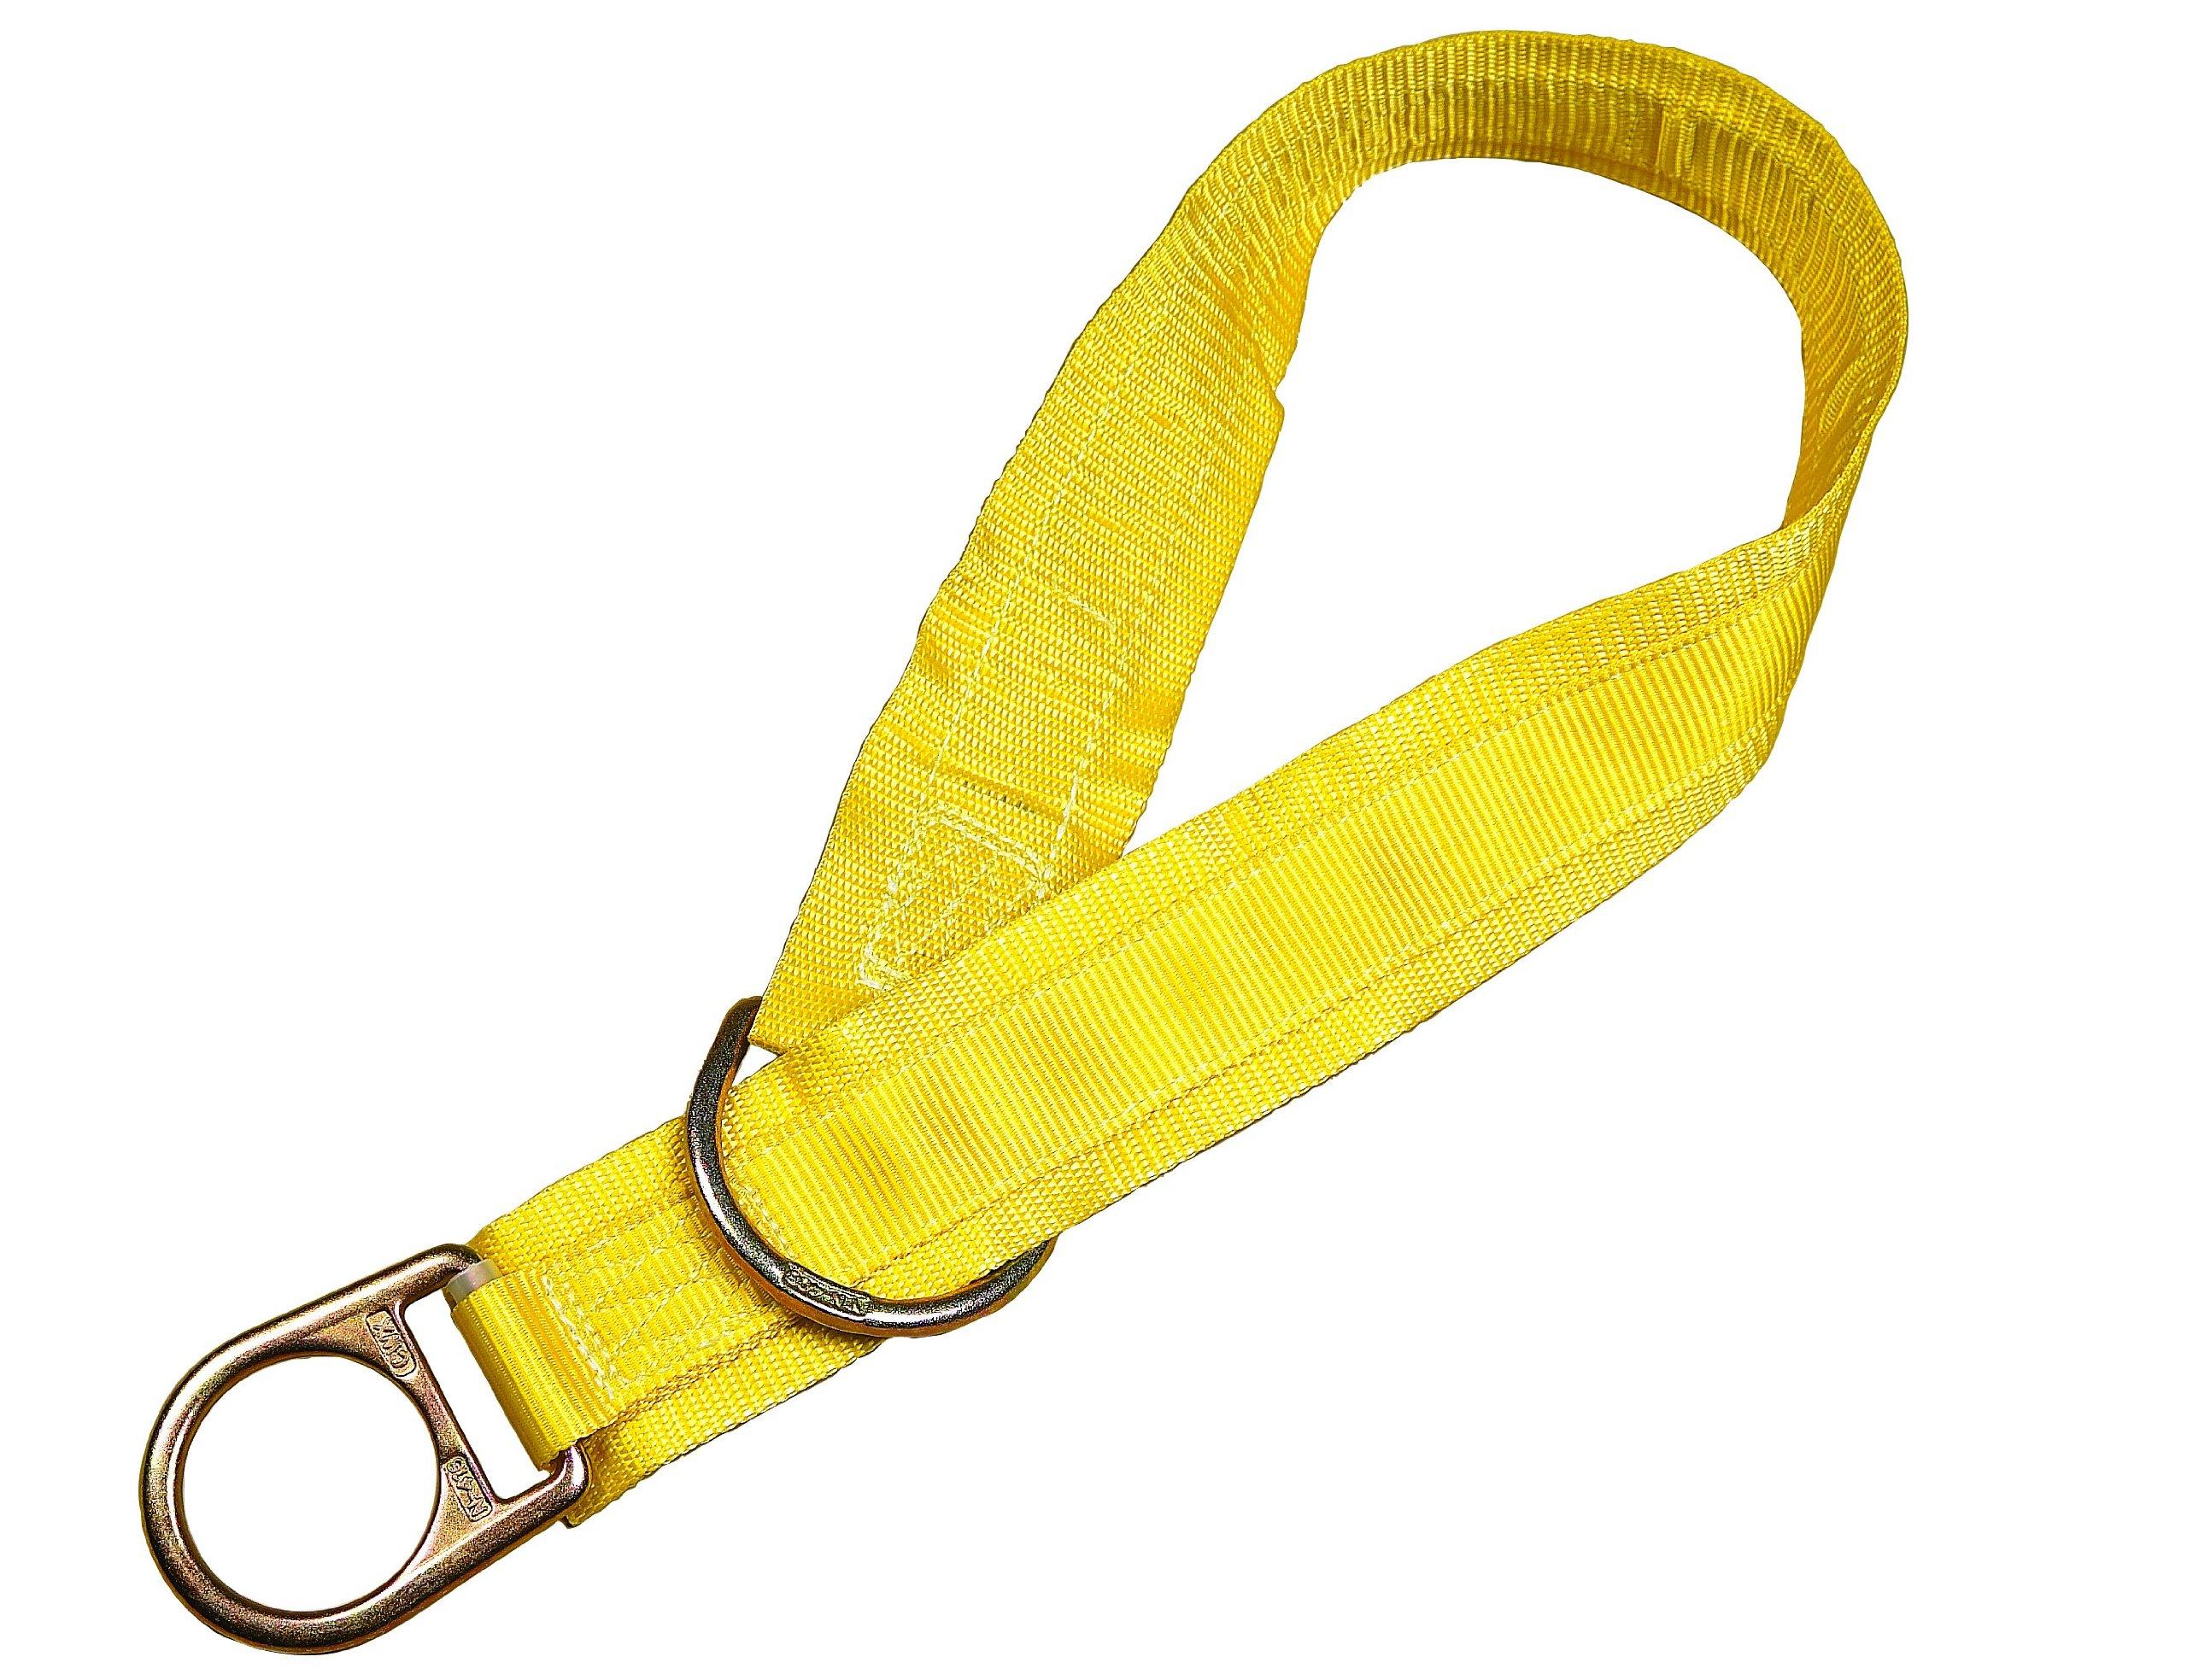 3M DBI-SALA 1002010 Tie Off Adaptor, 10', Pass-Thru Type, Yellow by 3M Personal Protective Equipment